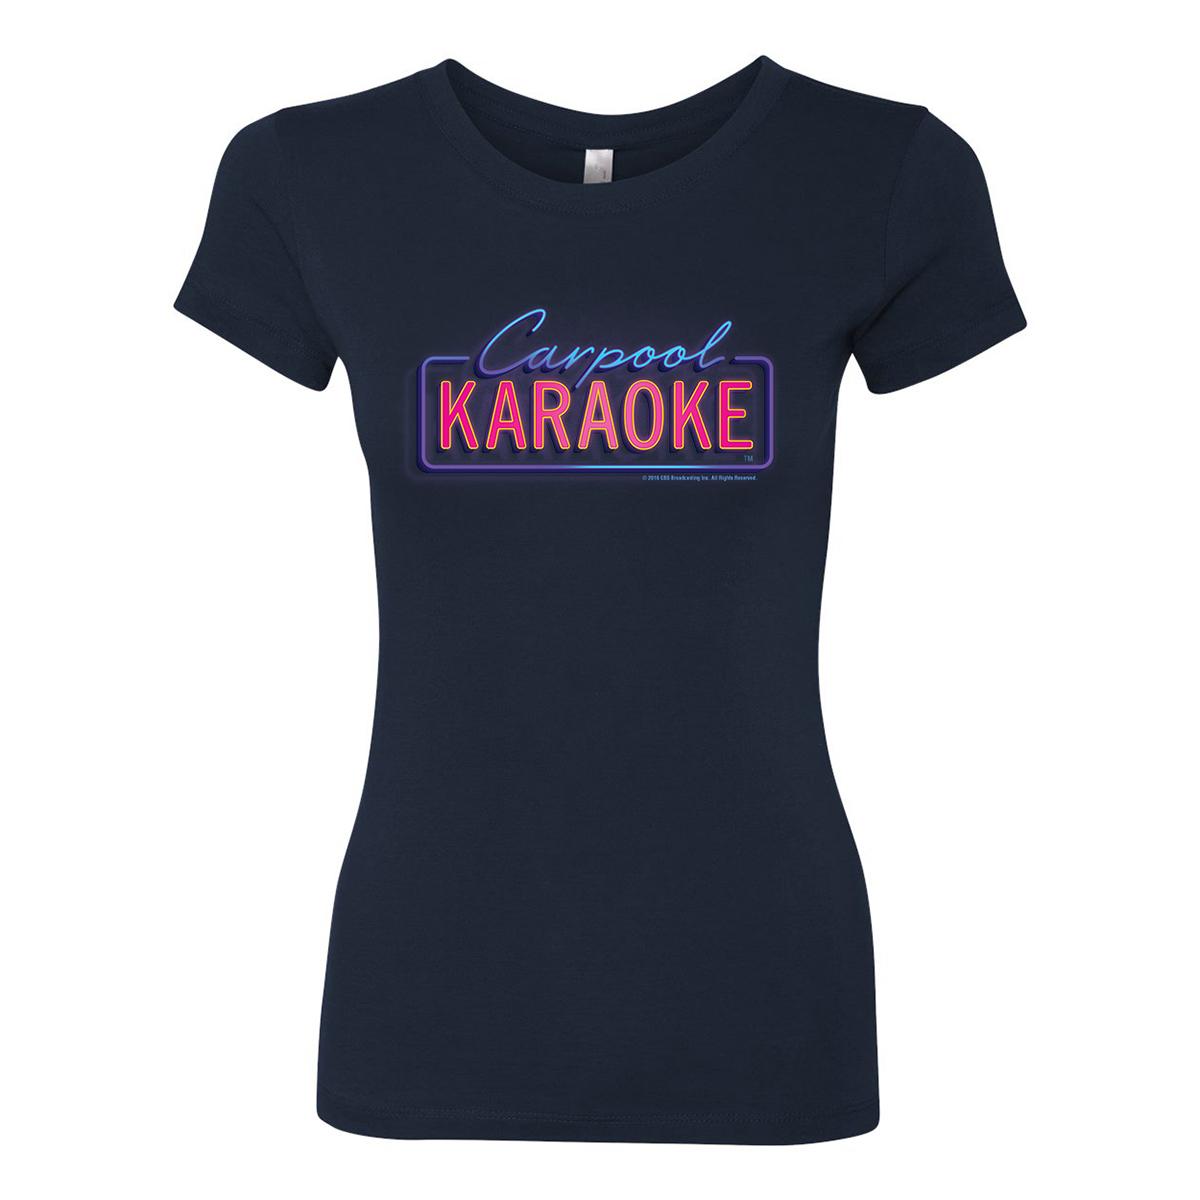 James Corden Carpool Karaoke Neon Logo Women's T-Shirt